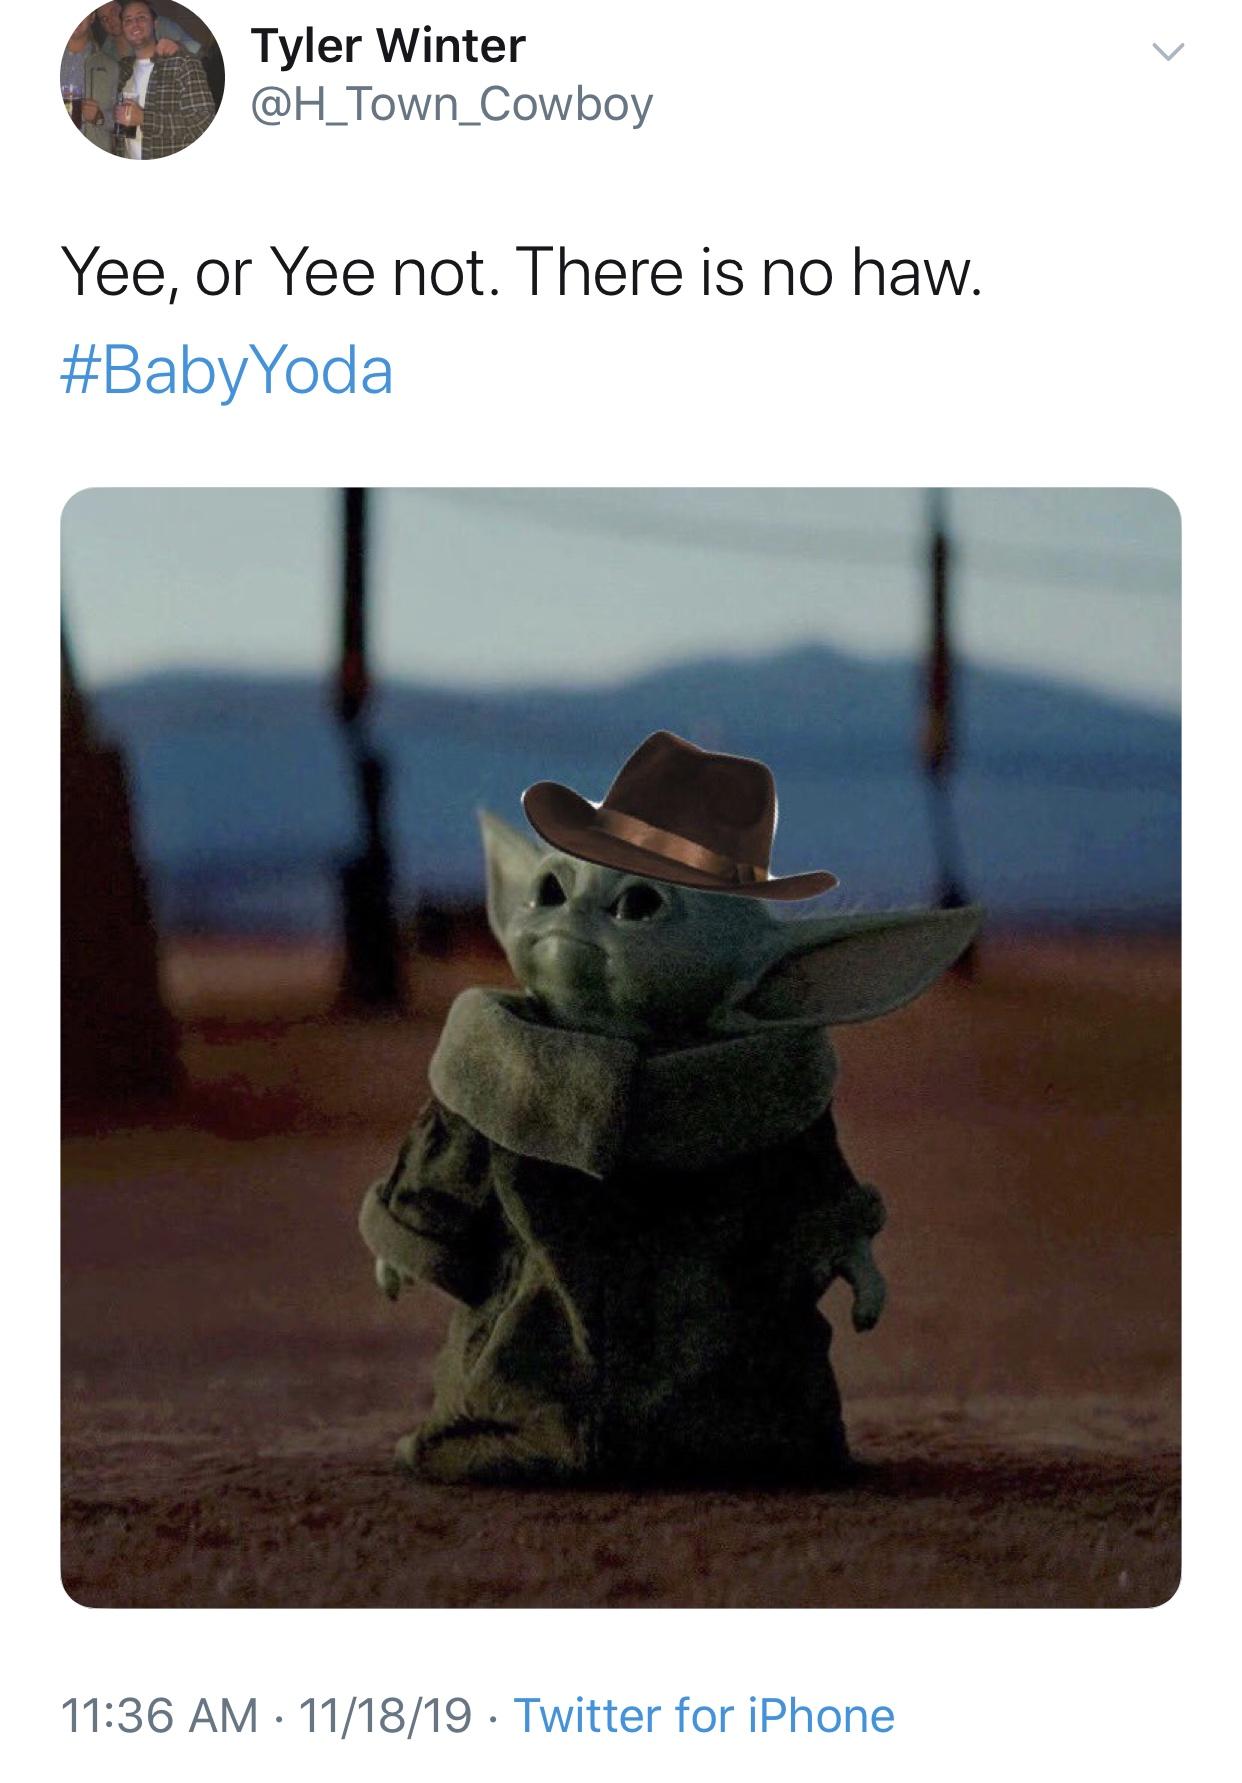 yee or yee not baby yoda meme, baby yoda meme, baby yoda memes, funny baby yoda meme, funny baby yoda memes, cute baby yoda meme, cute baby yoda memes, best baby yoda meme, best baby yoda memes, baby yoda meme funny, baby yoda meme cute, baby yoda memes funny, baby yoda memes cute, funny baby yoda picture, funny baby yoda pictures, funny baby yoda image, funny baby yoda images